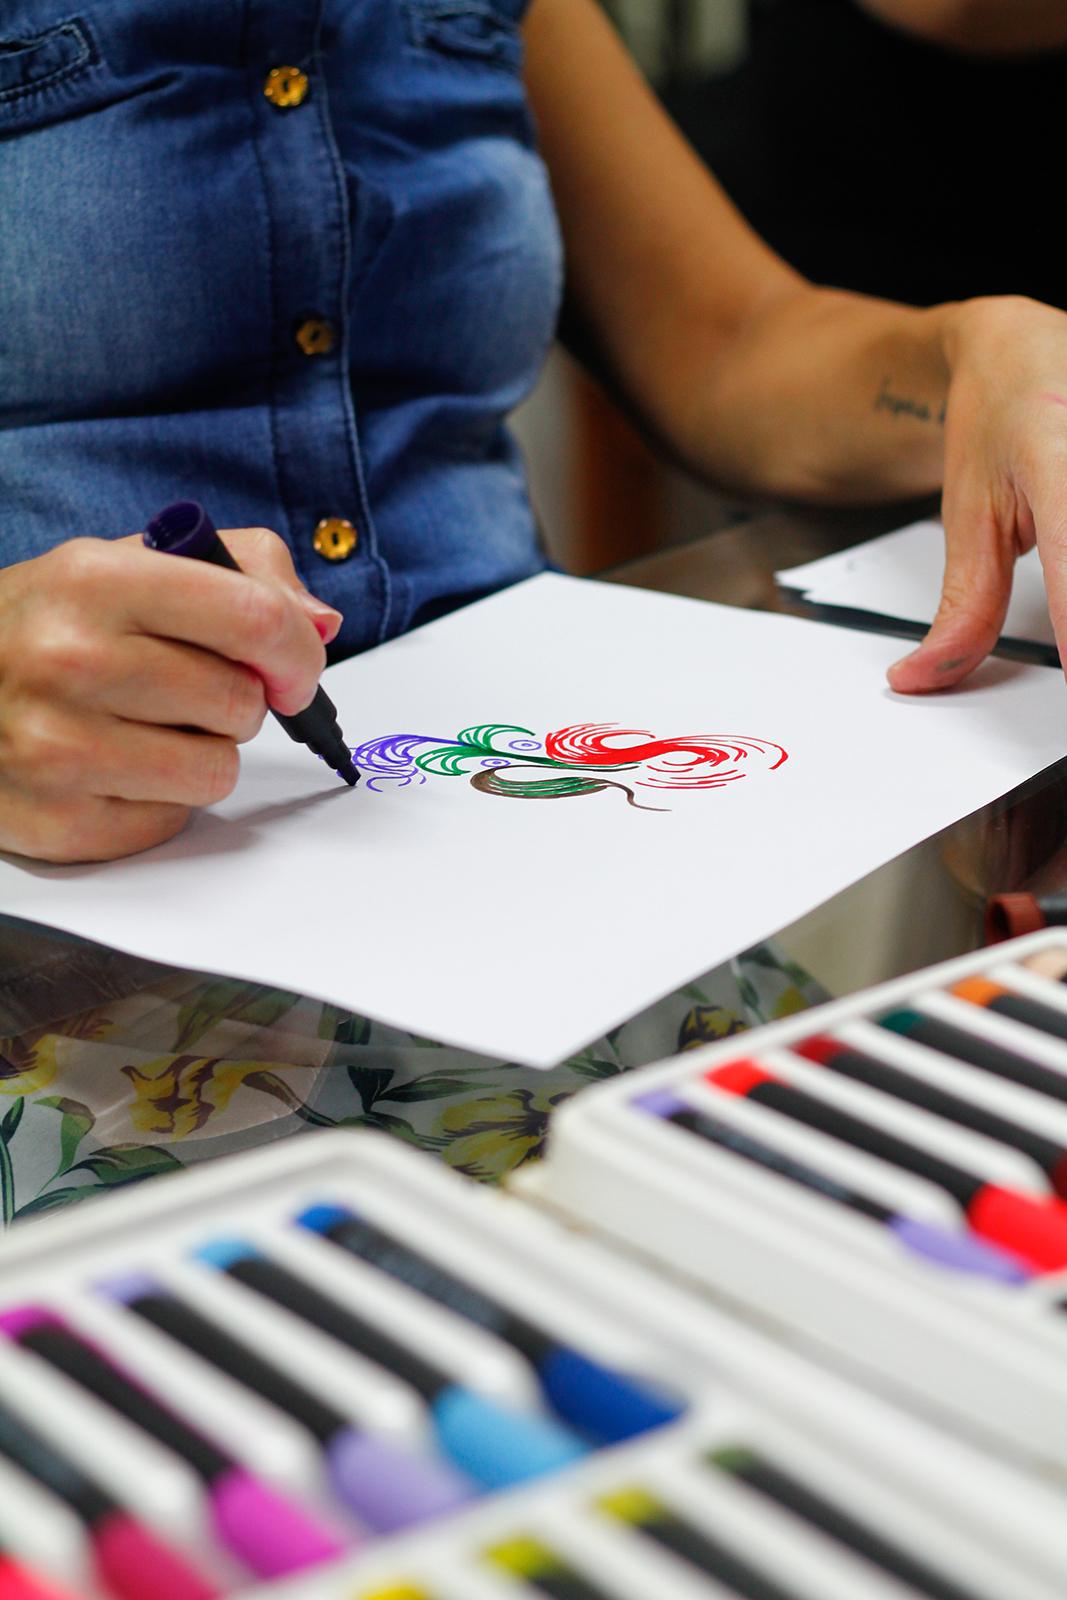 projeto_albatroz_desenho_serigrafia_galeria_de_gravura_1